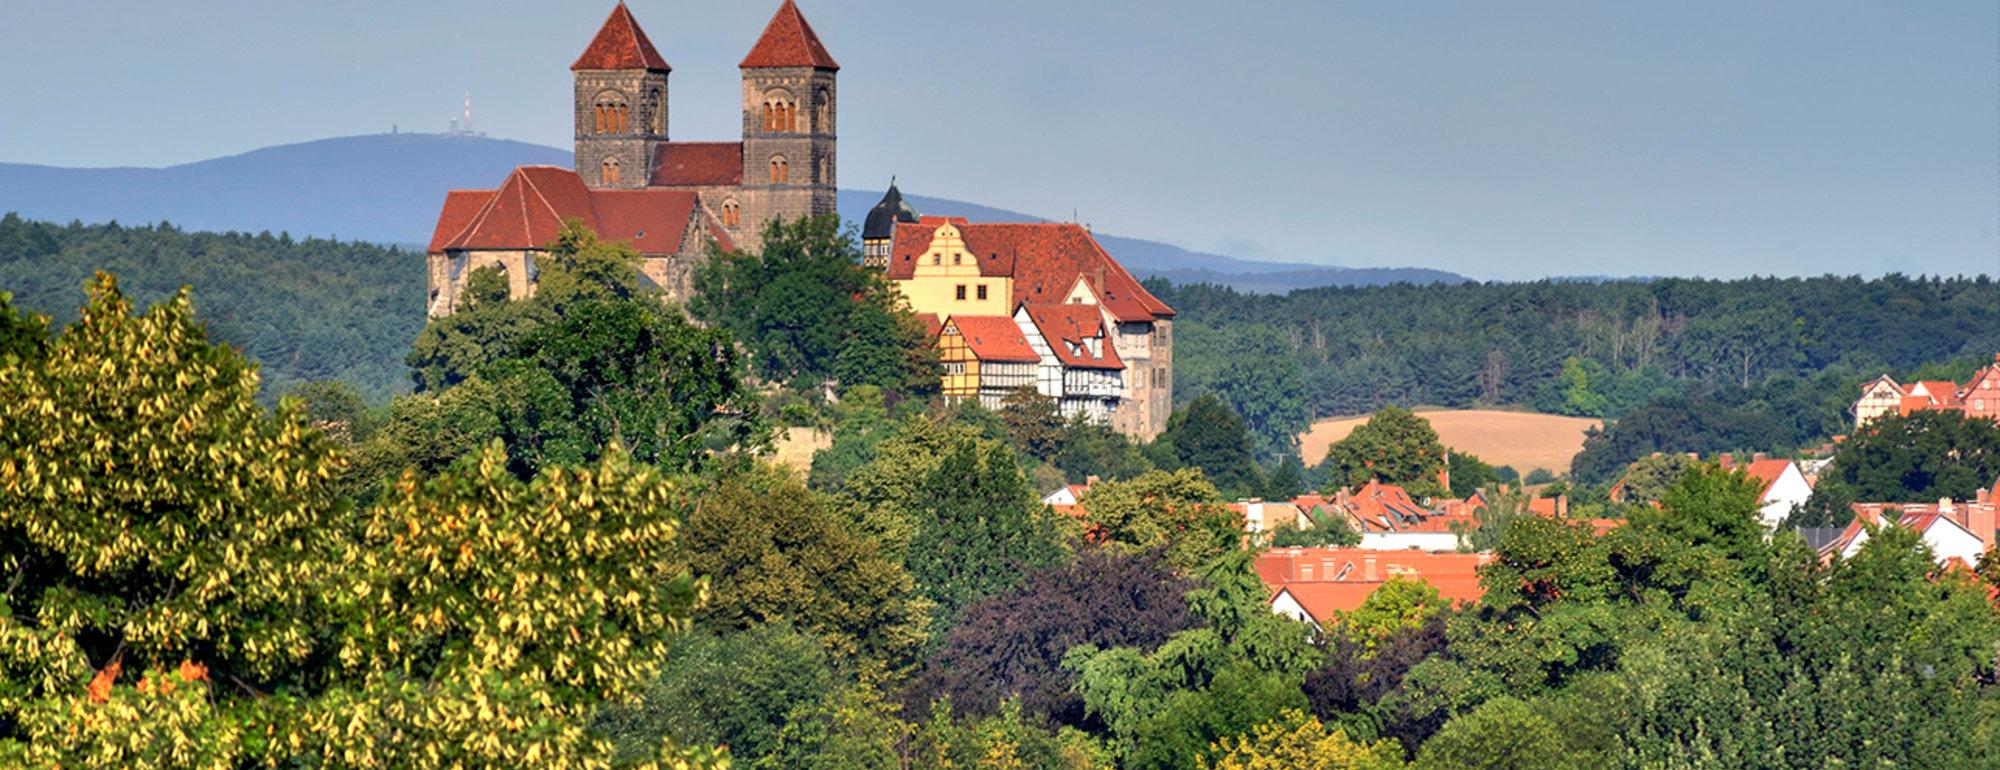 Stiftskirche Harz